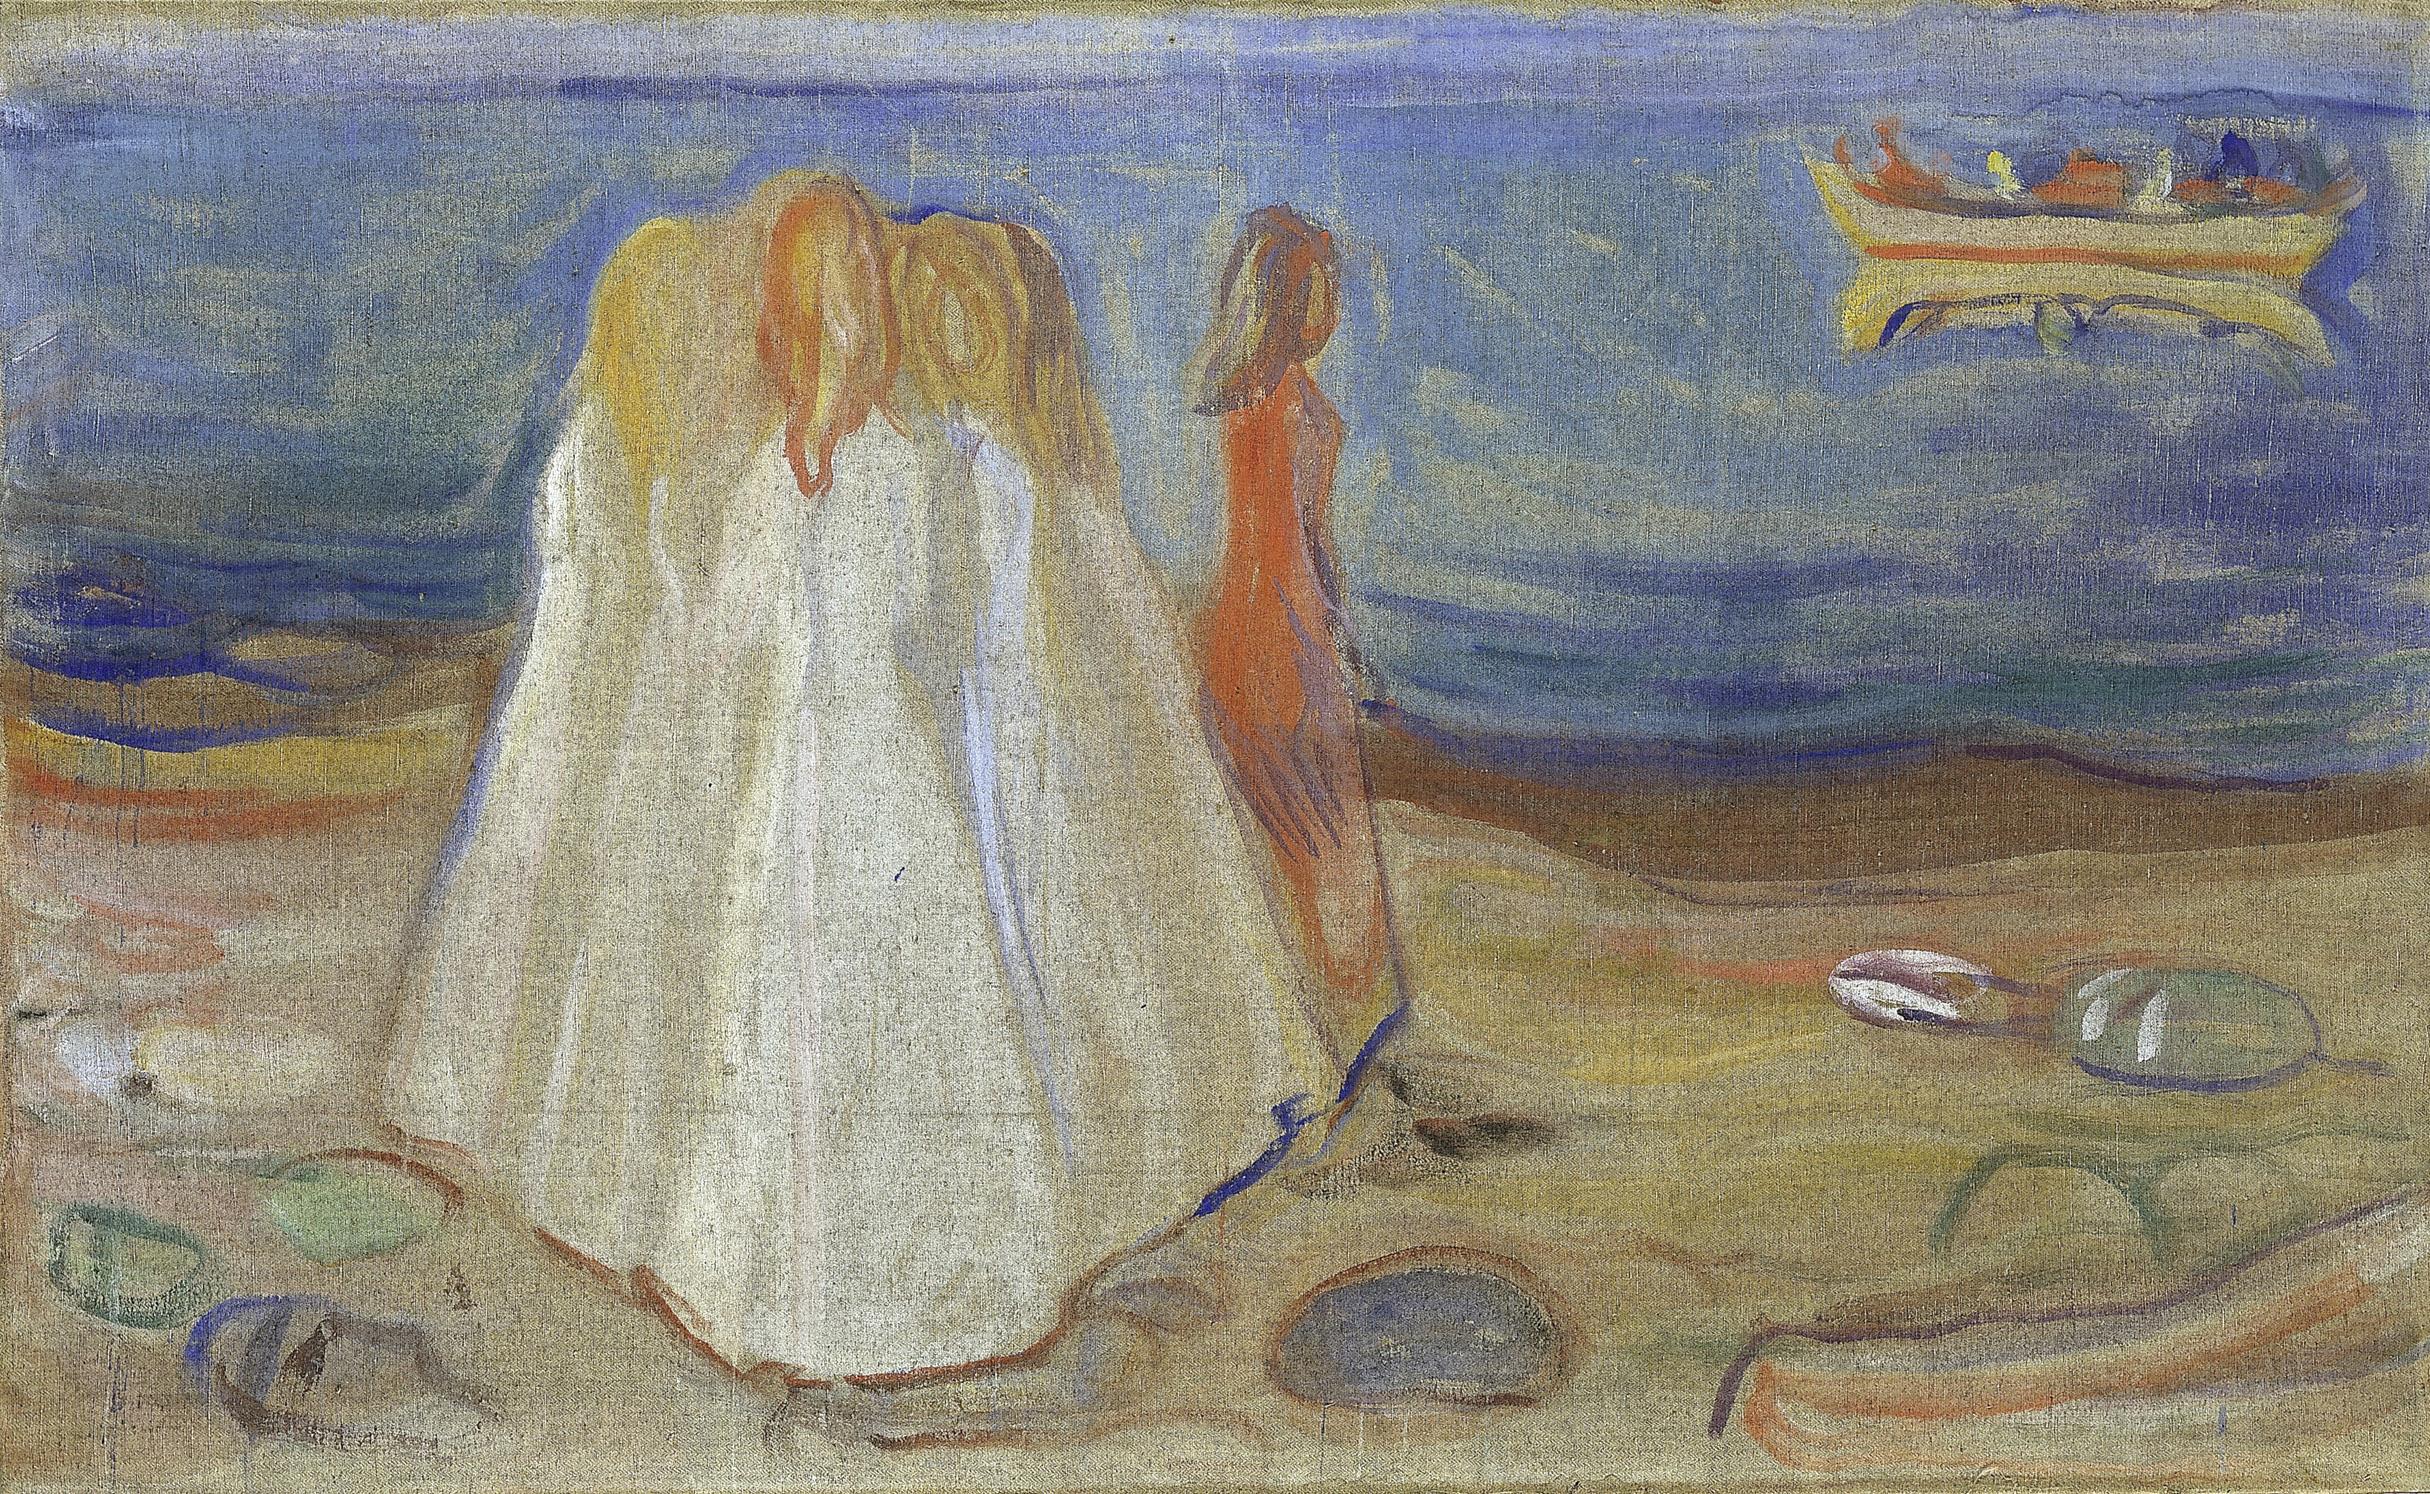 Edvard Munch (1863 - 1944) Mädchen am Meer, 1906/07 © Hamburger Kunsthalle / bpk; Foto: Elke Walford